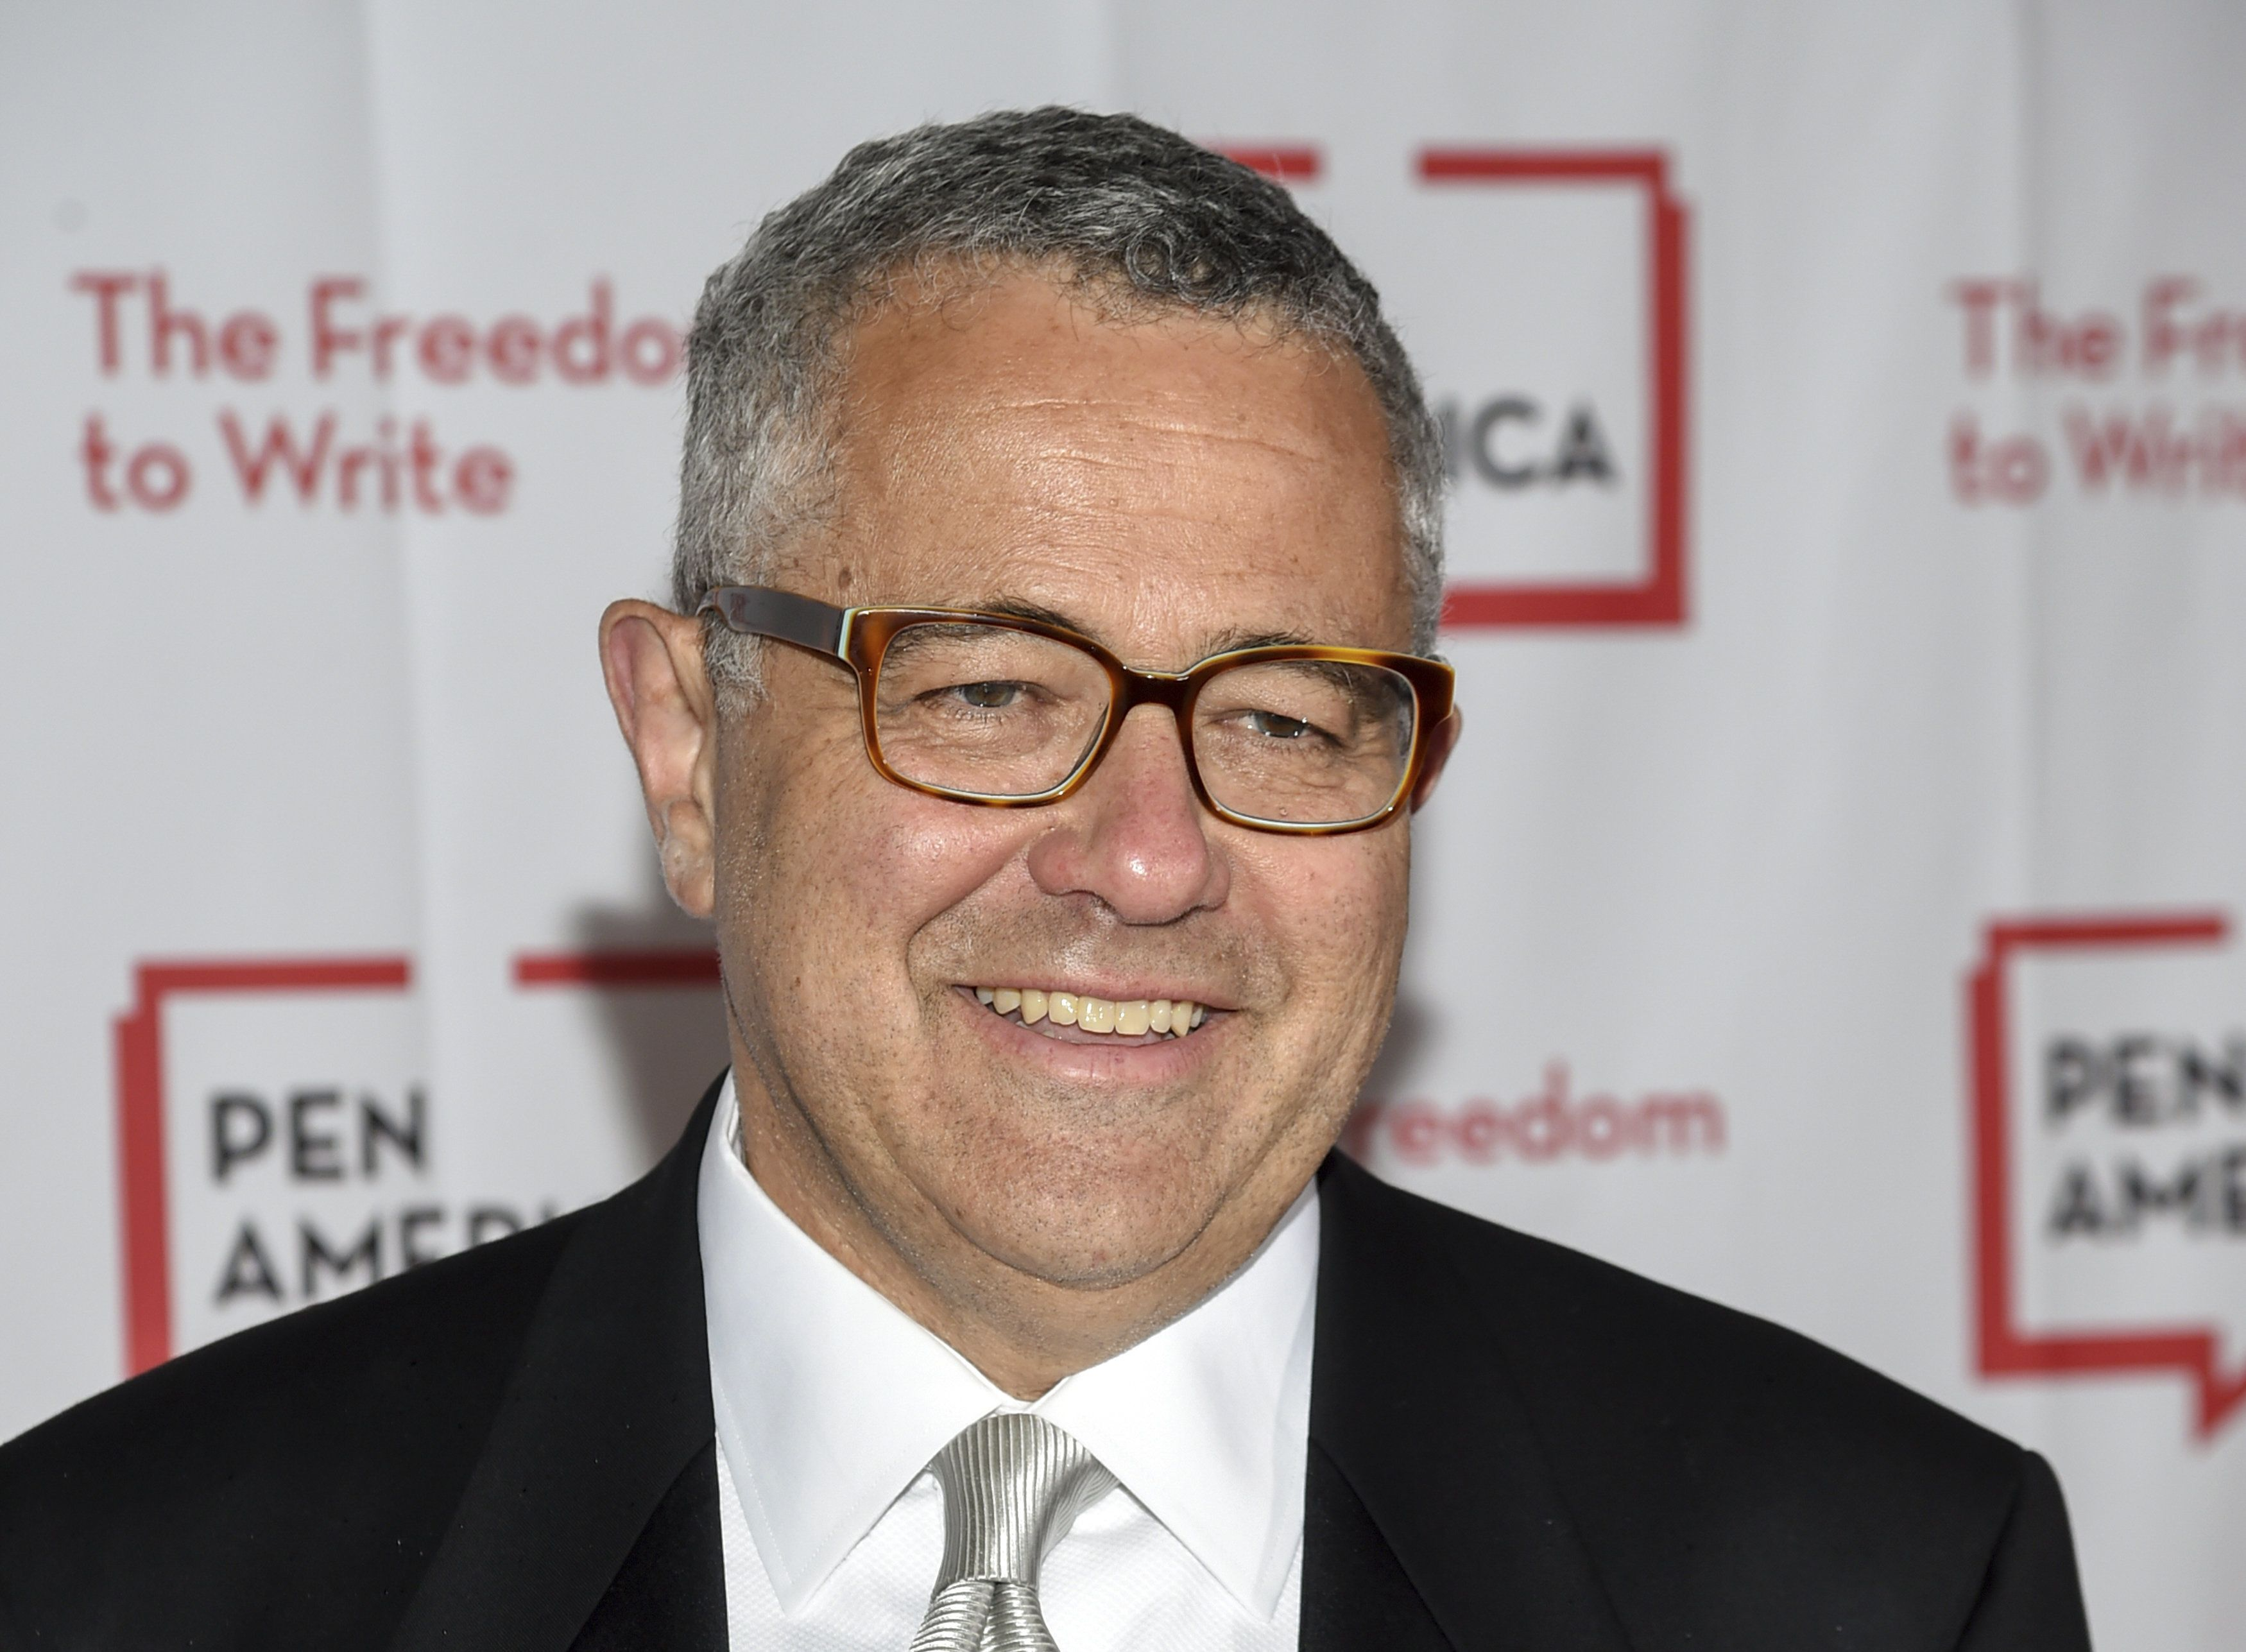 Cnn S Jeffrey Toobin Bluntly Sums Up Fox News Primetime Coverage Cnn News Jeffrey